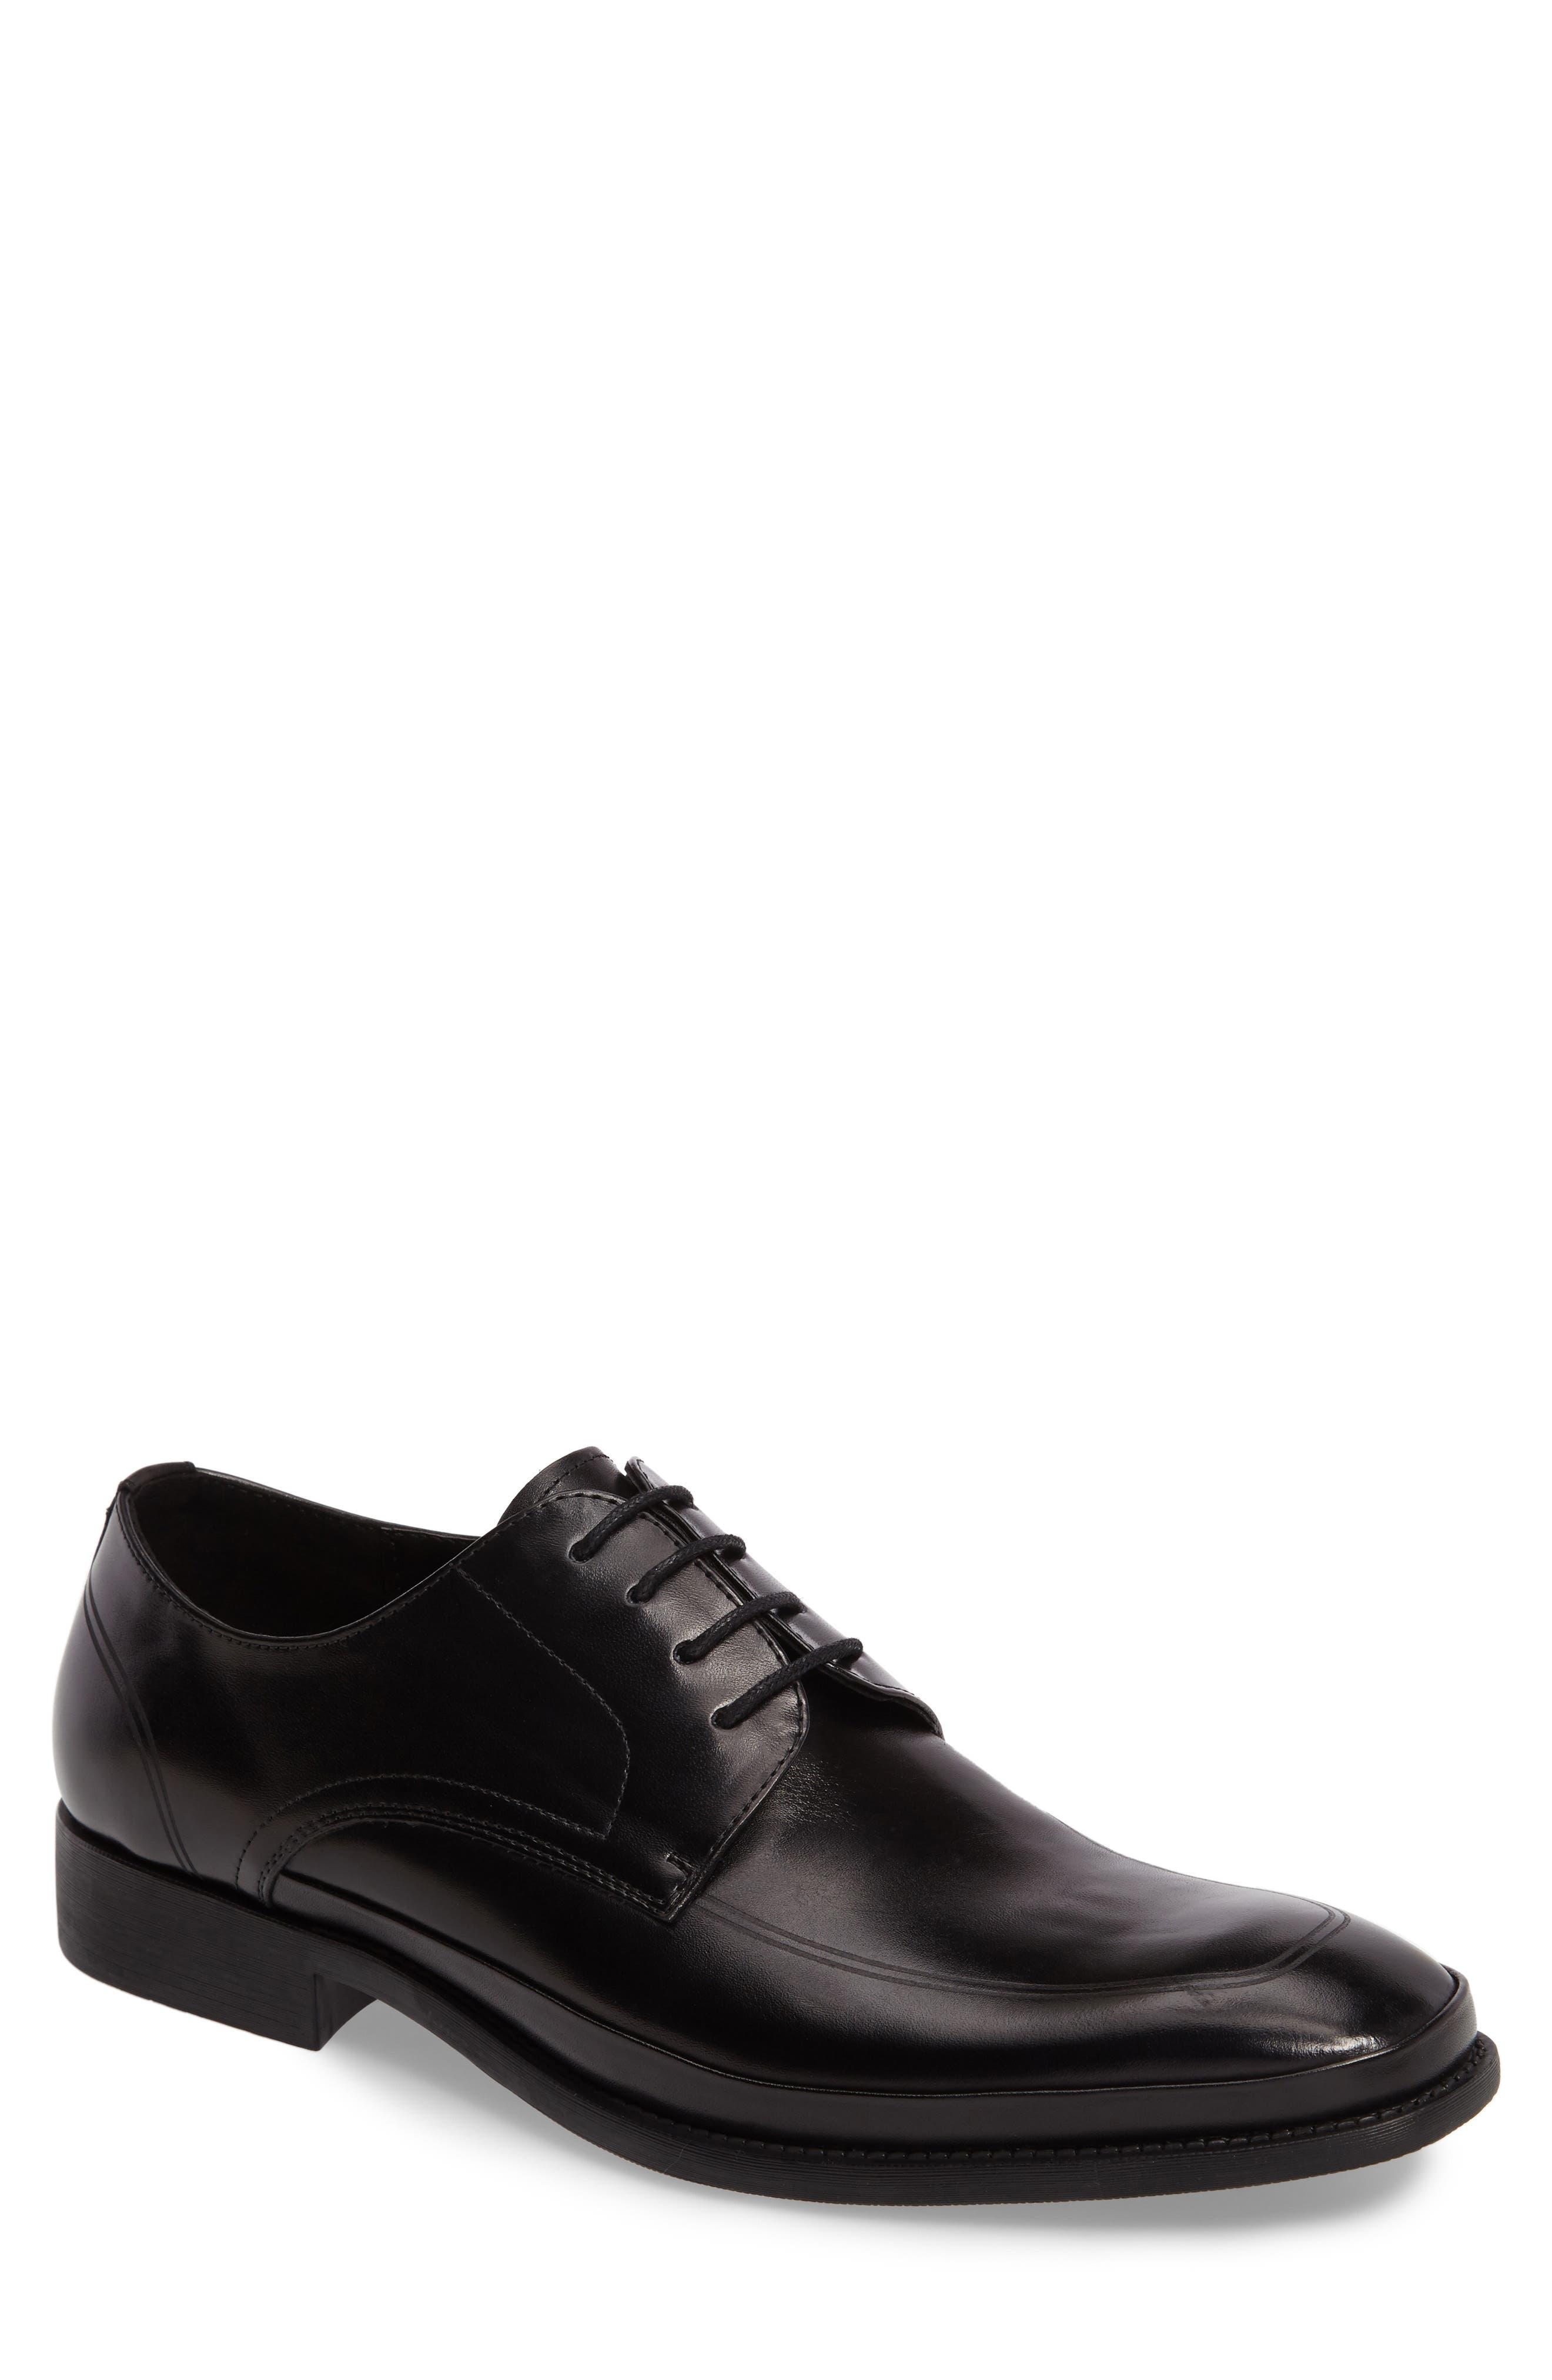 Brick Free Plain Toe Derby,                             Main thumbnail 1, color,                             Black Leather